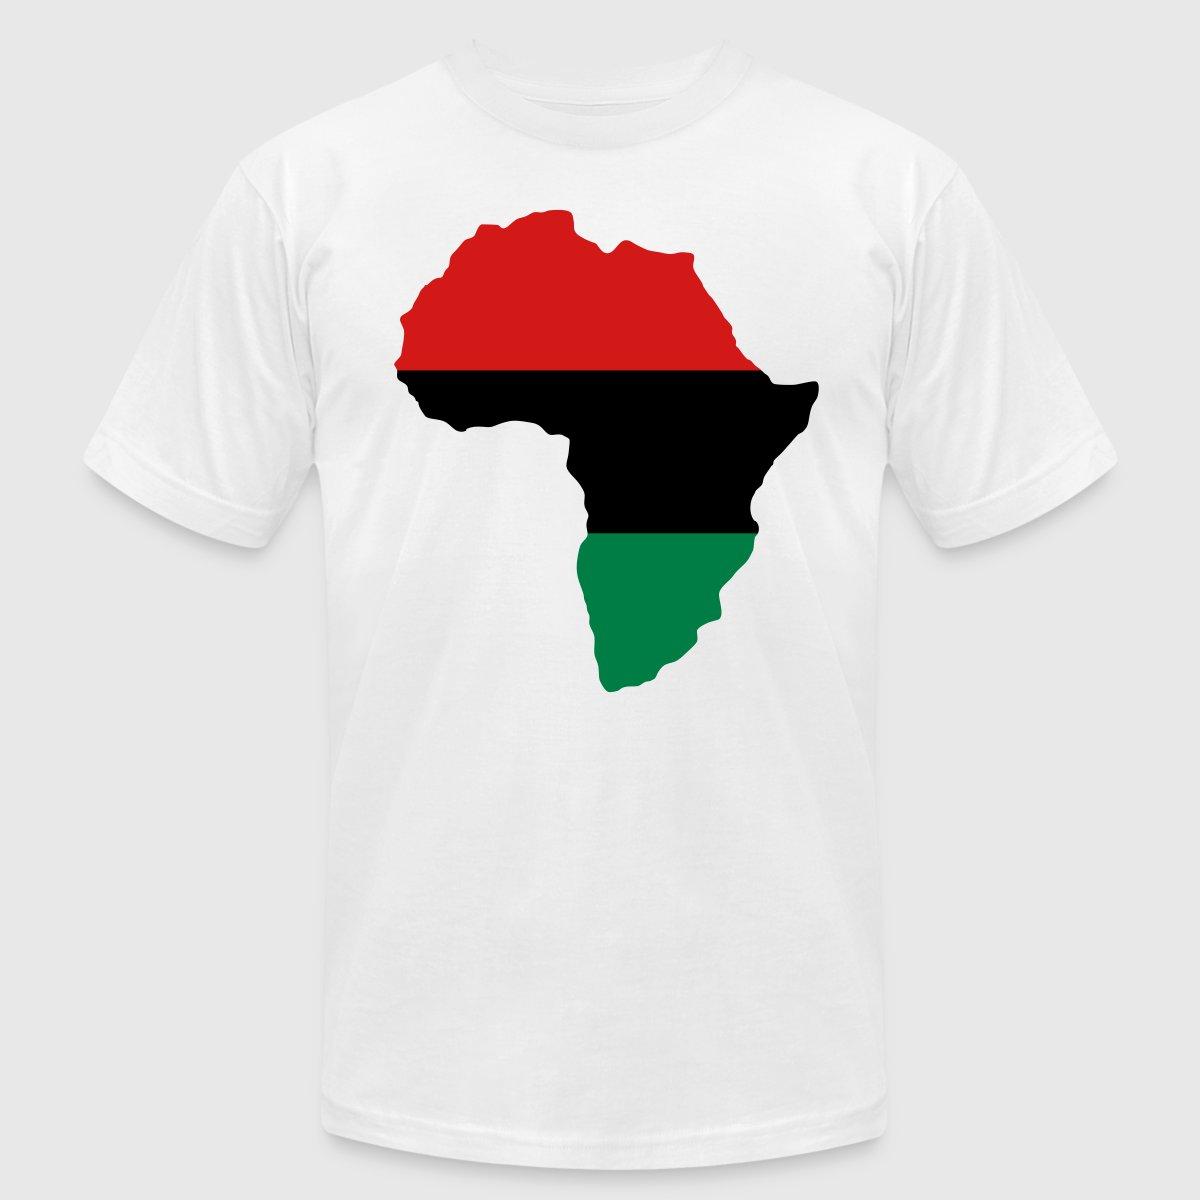 Black flag t shirt europe - Black Flag T Shirt Europe 6